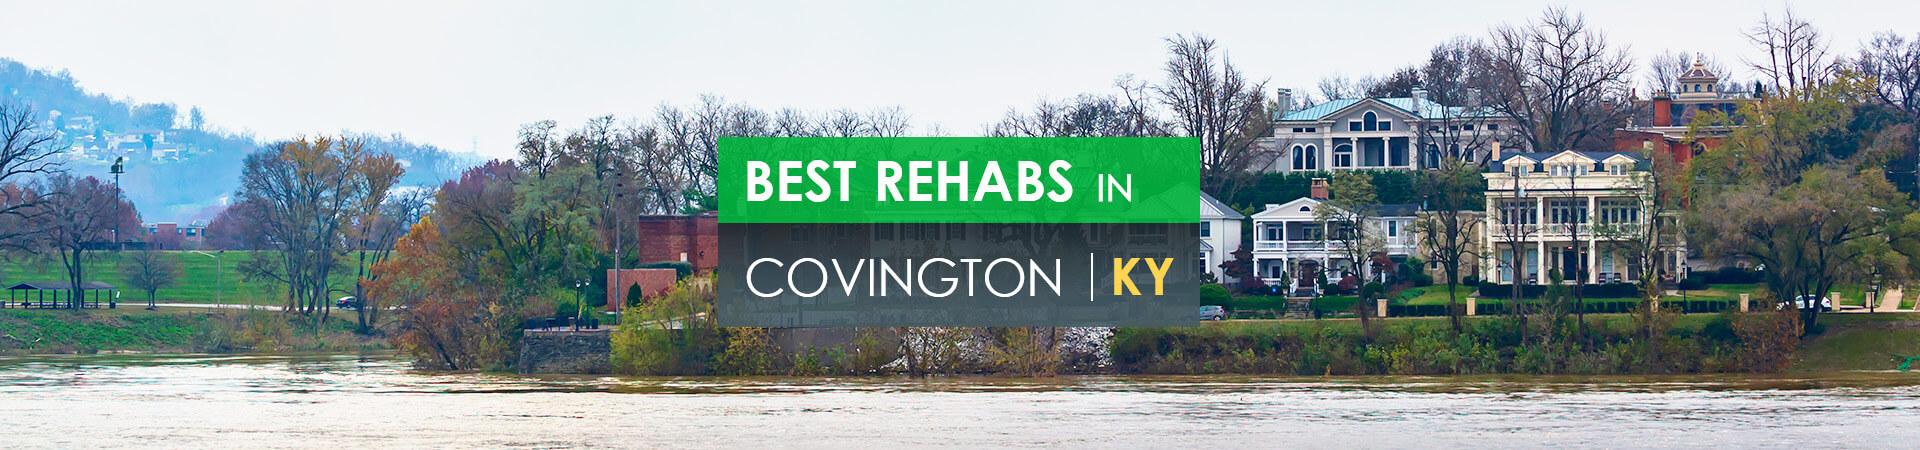 Best rehabs in Covington, KY